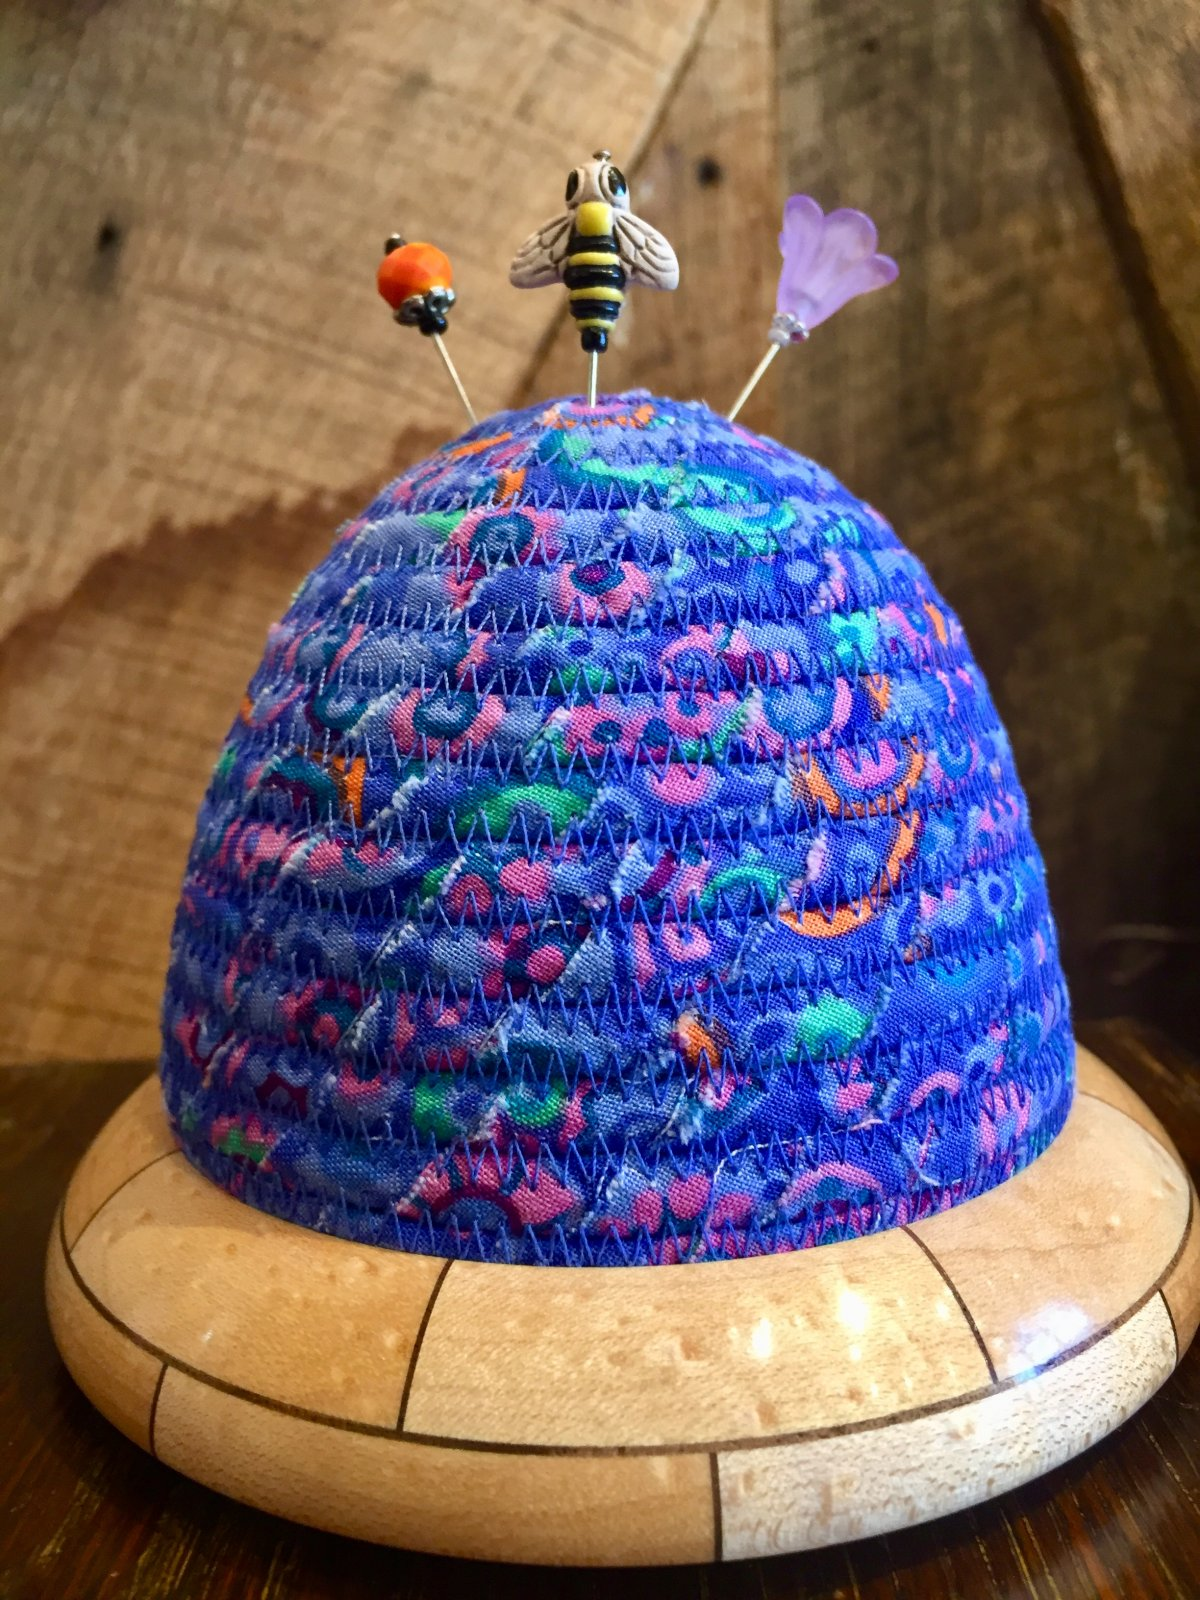 Beehive Pincushion - Kaffe Fassett Paperweight - Blue Top - Birdseye Maple / Walnut Base